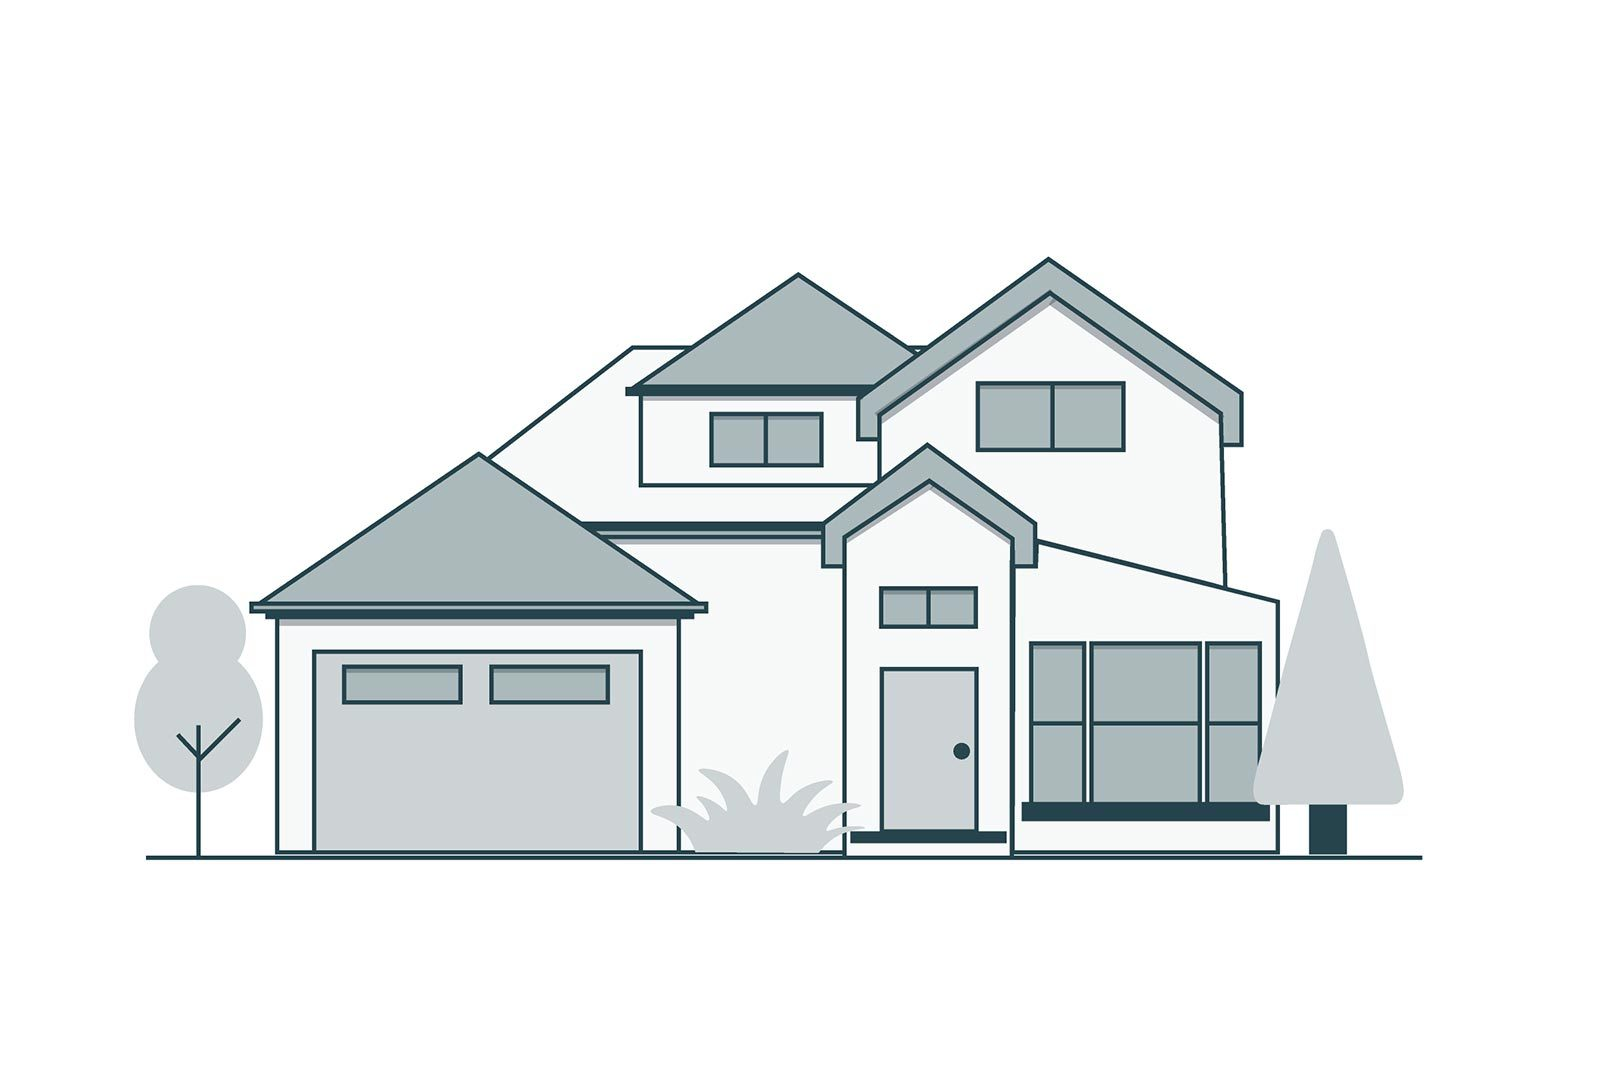 604 Funston Ave San Francisco, CA 94118